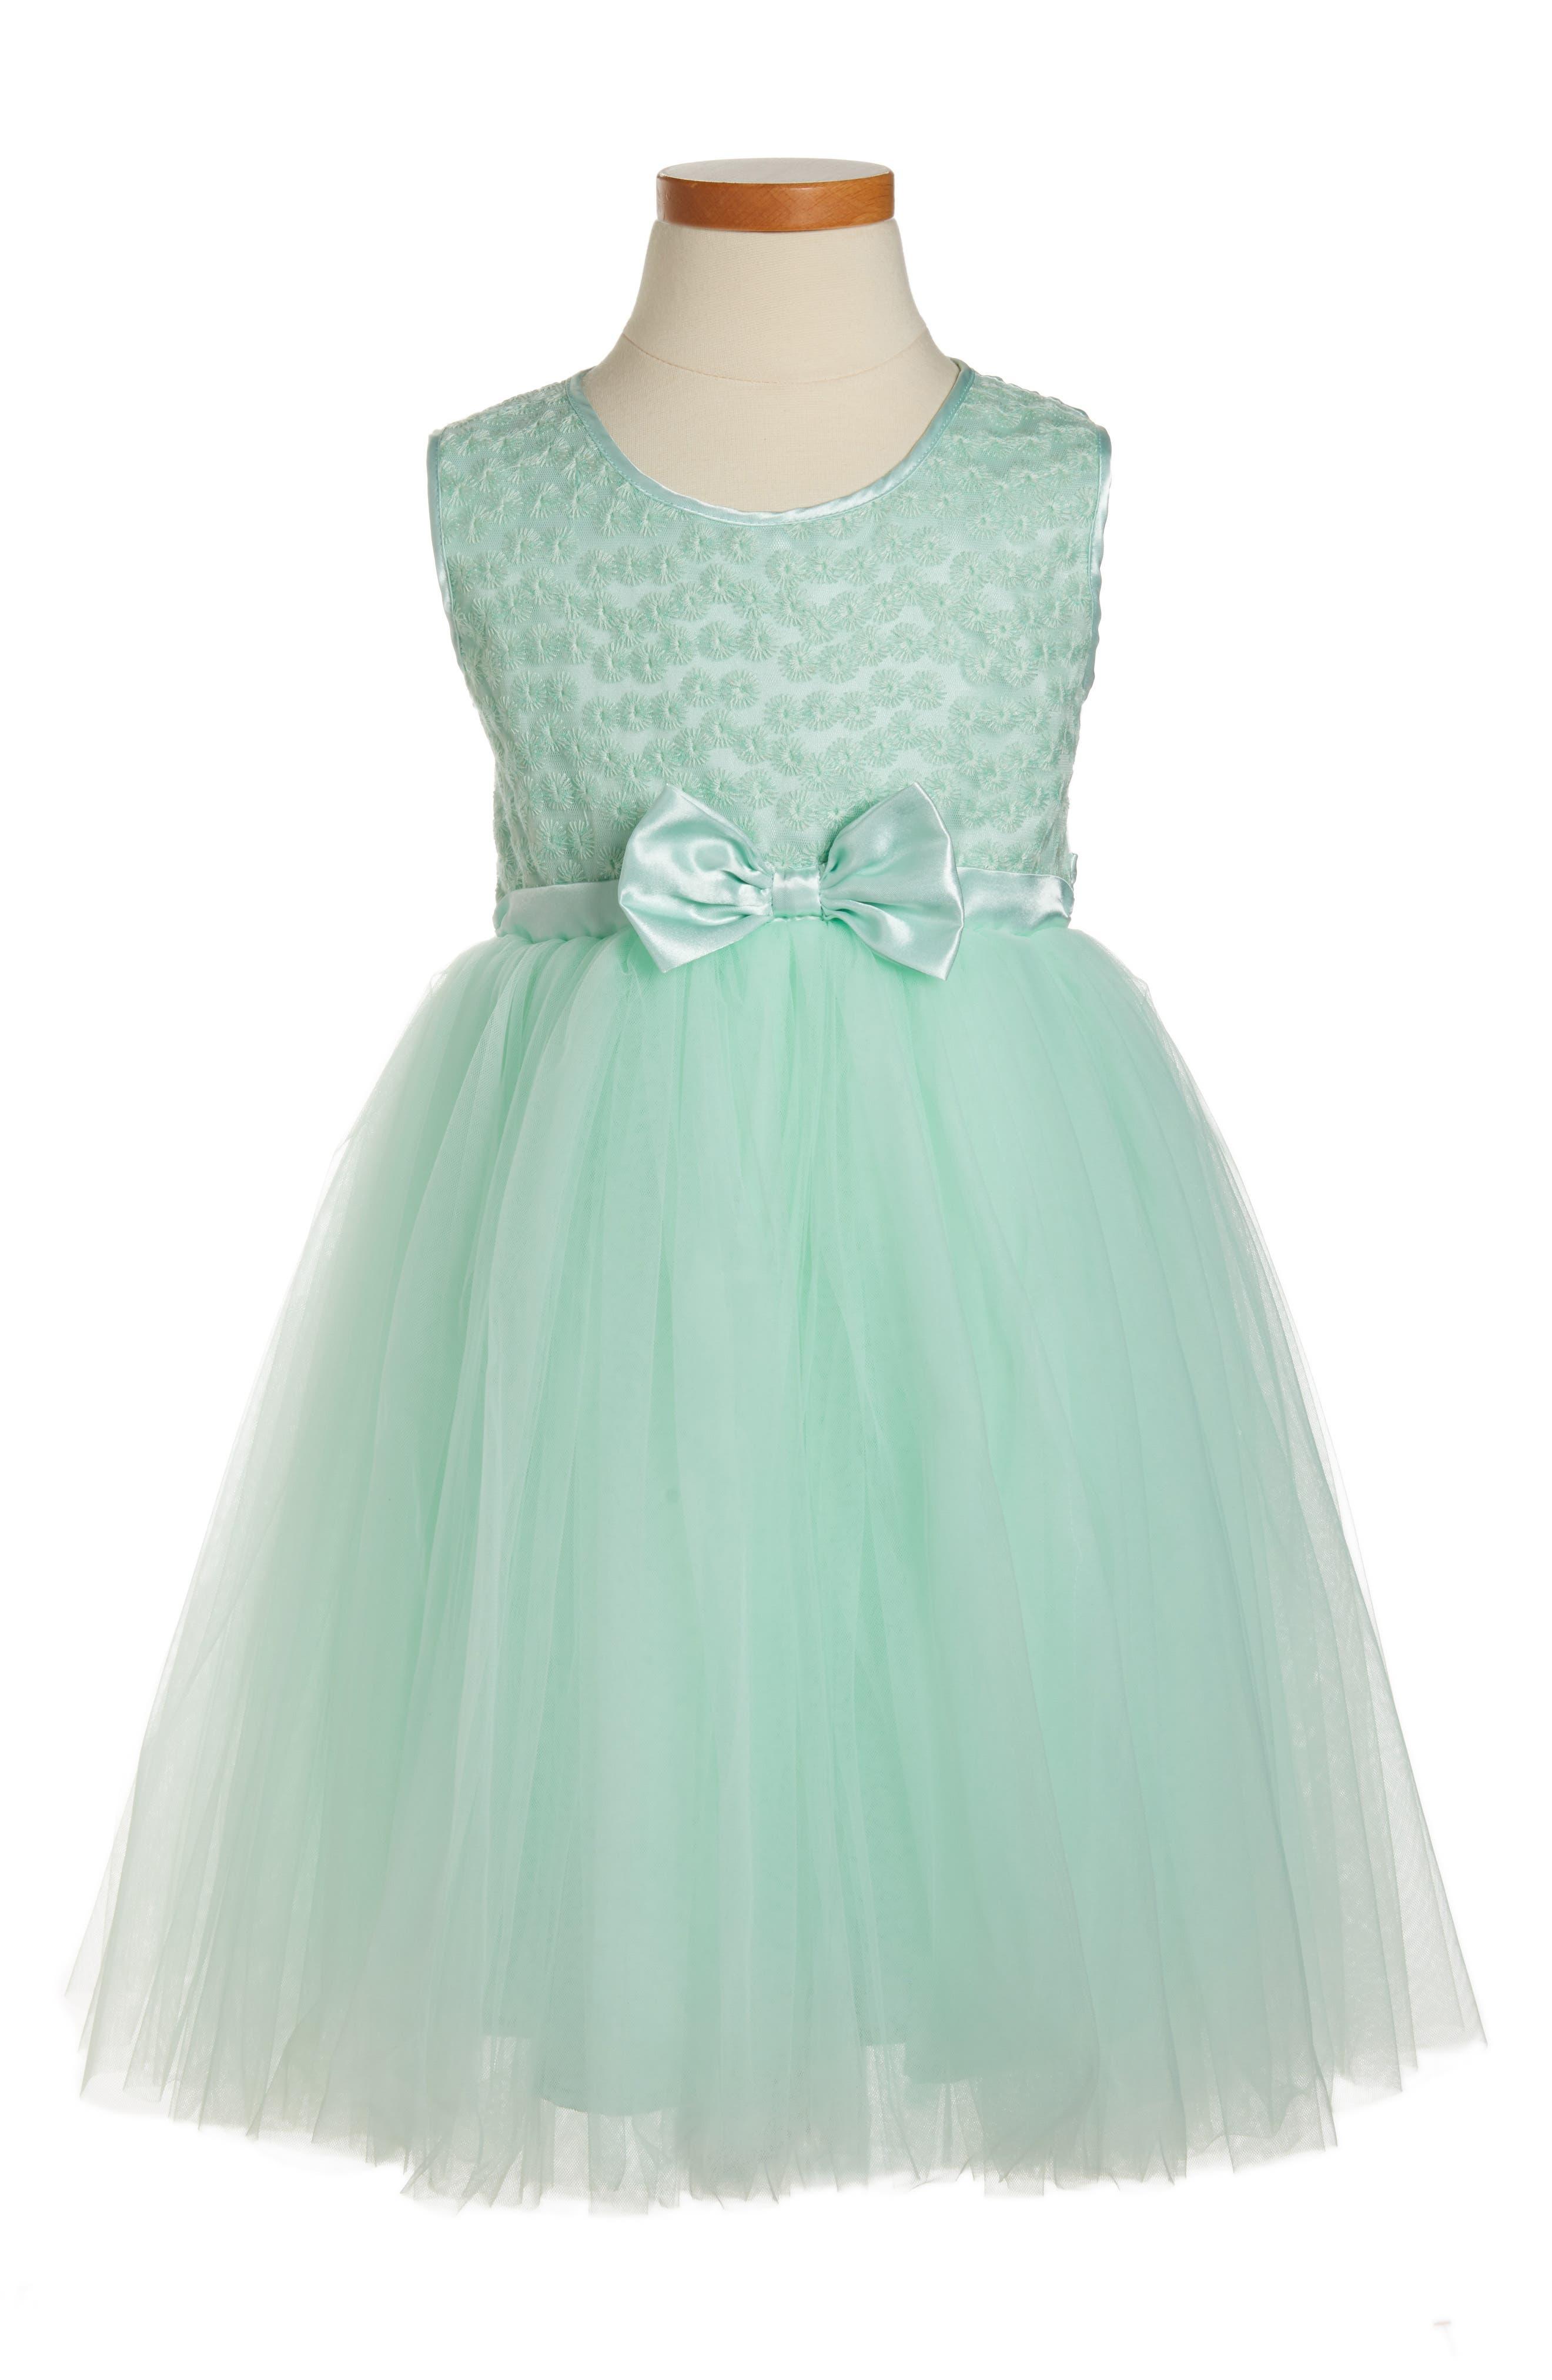 Alternate Image 1 Selected - Popatu Princess Sleeveless Dress (Toddler Girls, Little Girls & Big Girls)